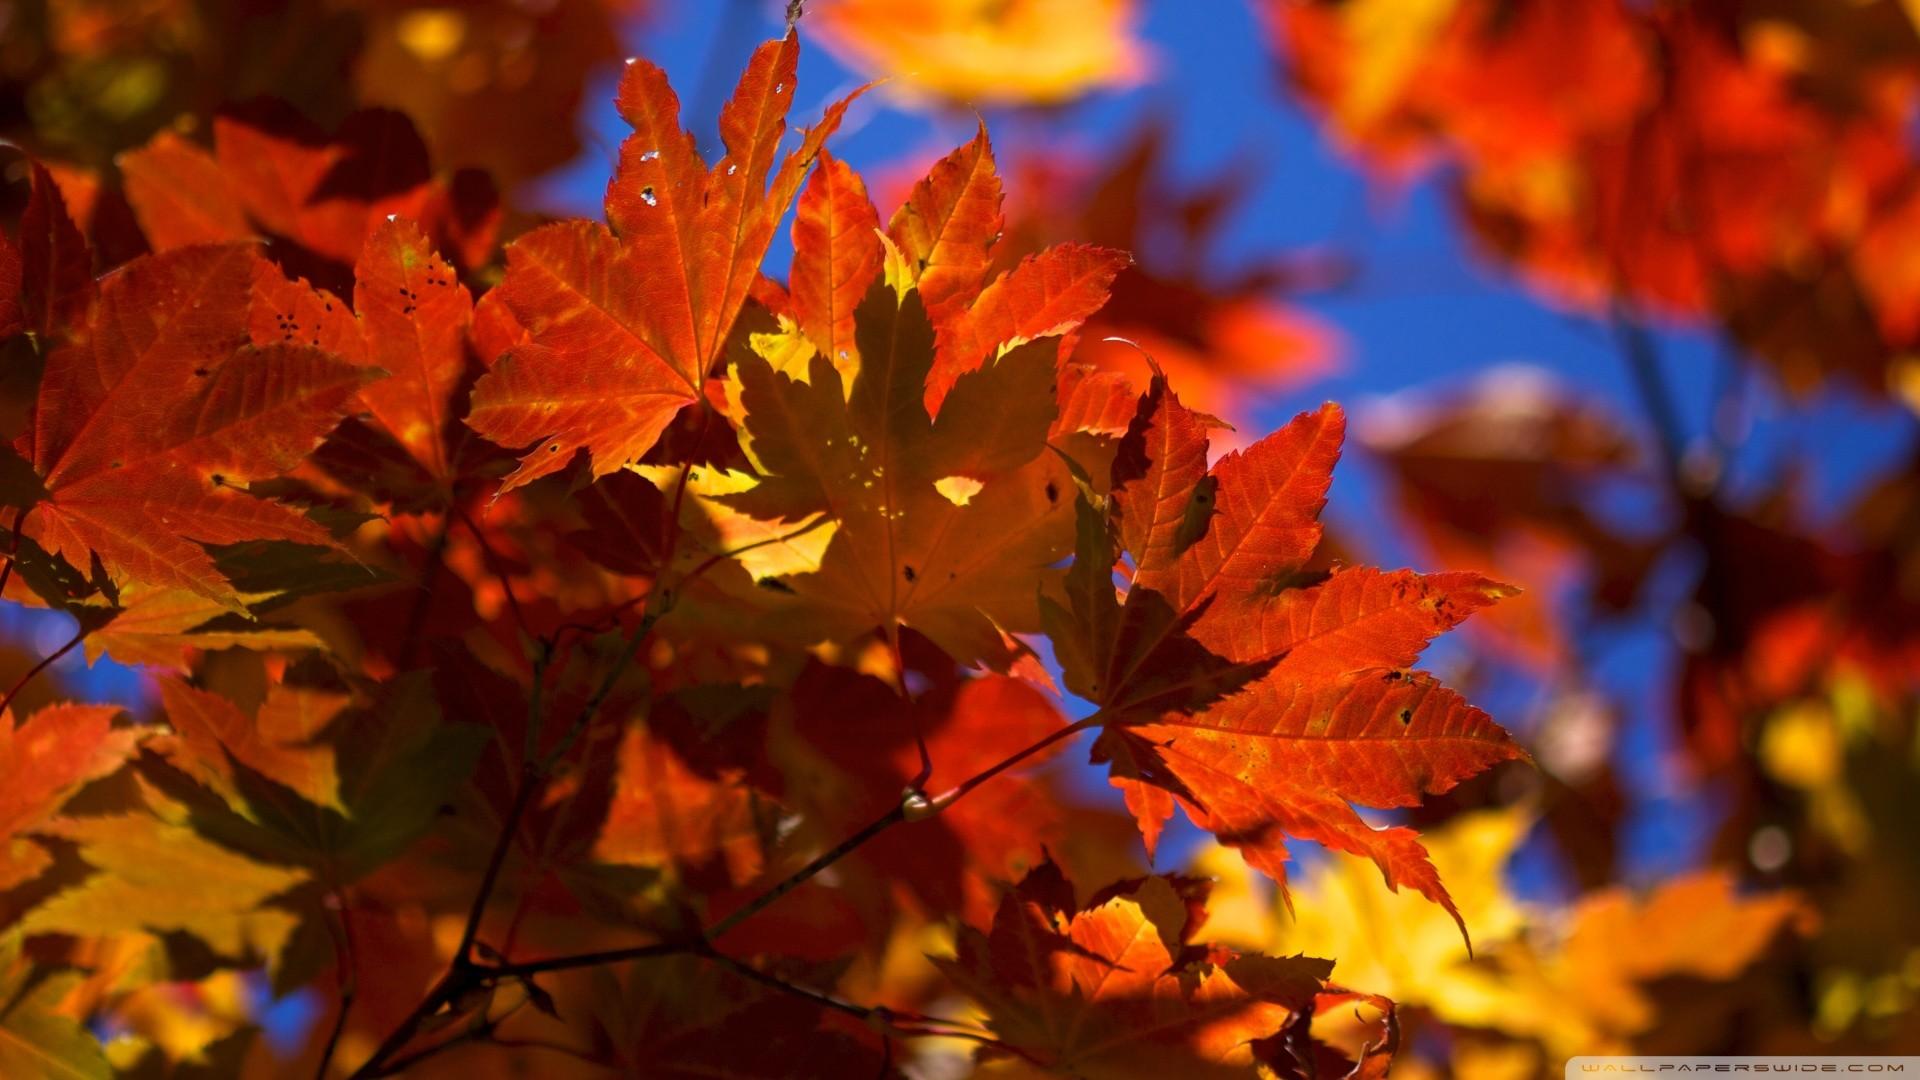 Autumn Leaves Falling Wallpaper